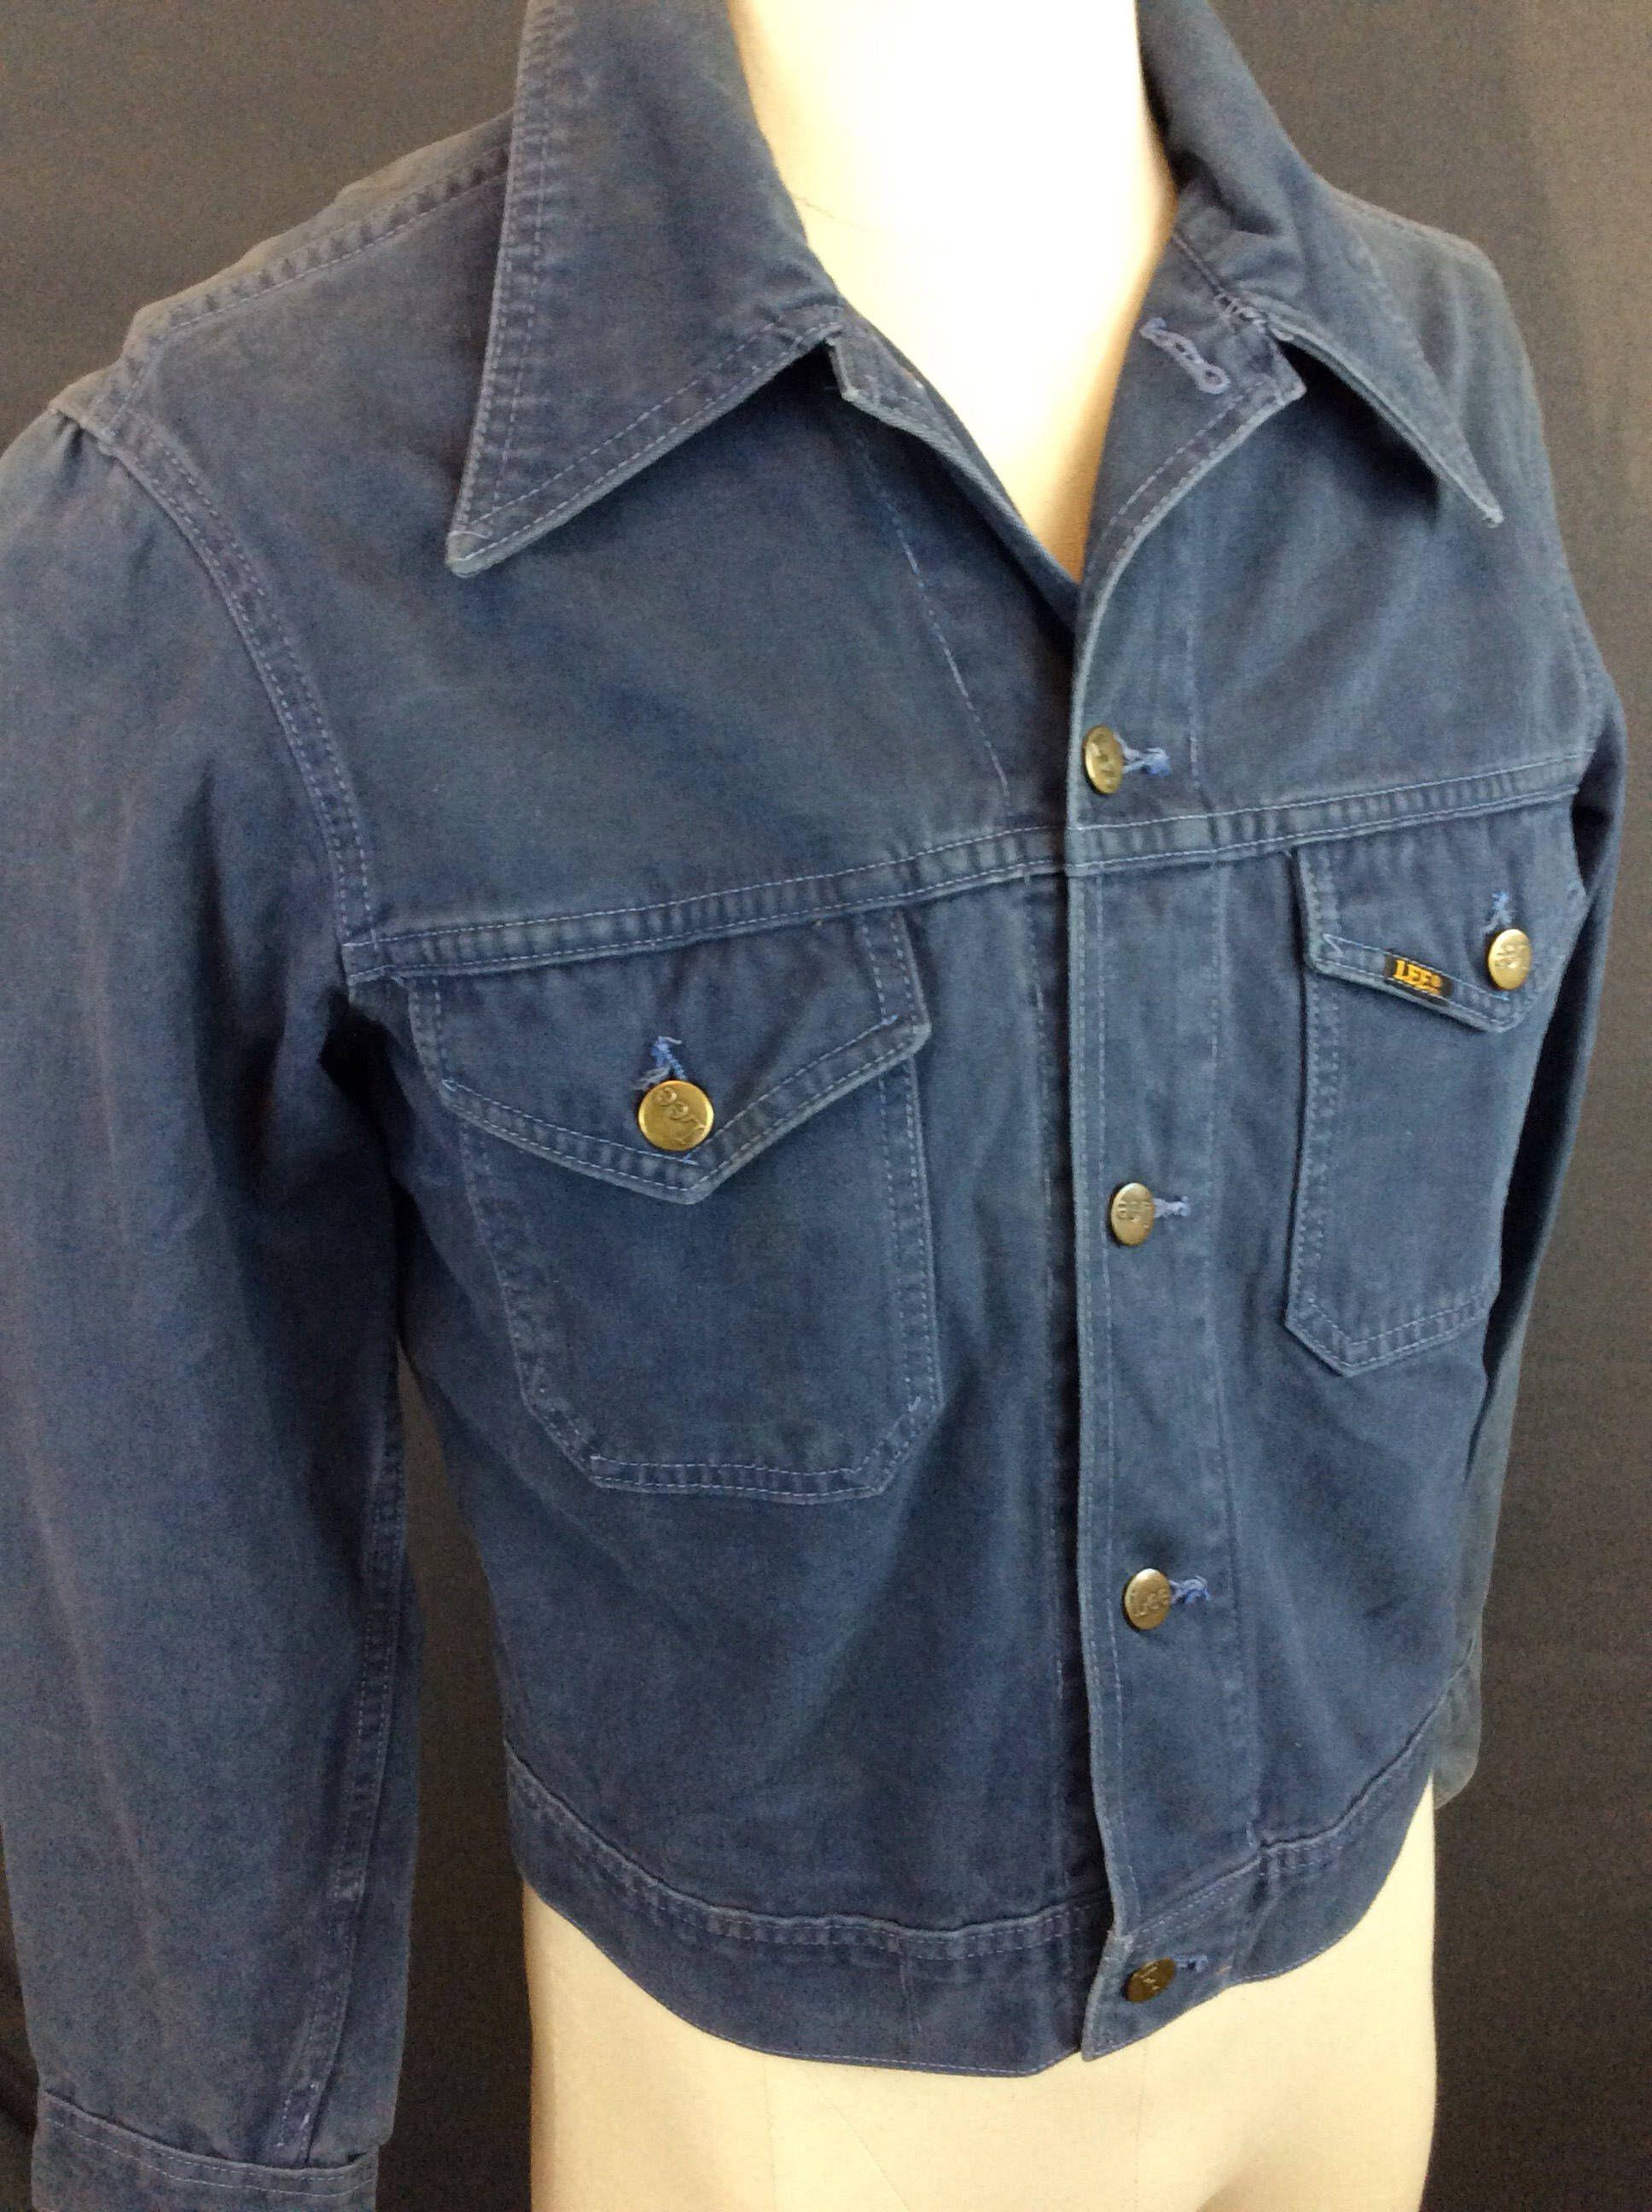 Vintage Jacket 70 S Denim Jacket Lee Blue Jean Jacket Etsy Lee Denim Jacket Leather Jacket Men Vintage Denim Jacket [ 2592 x 1936 Pixel ]